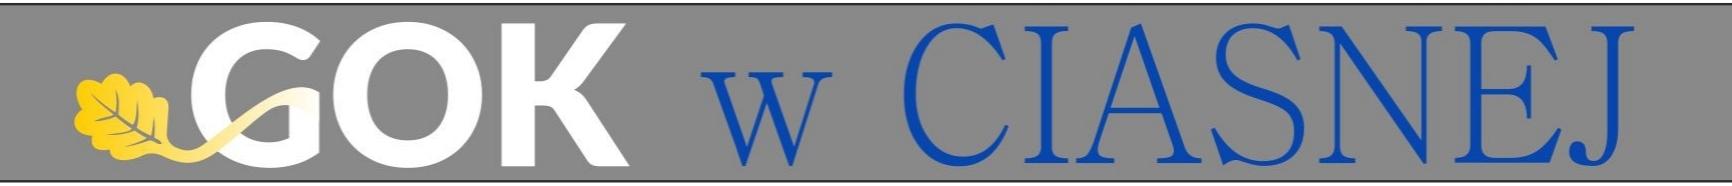 logo_gok1jpg [1732x186]